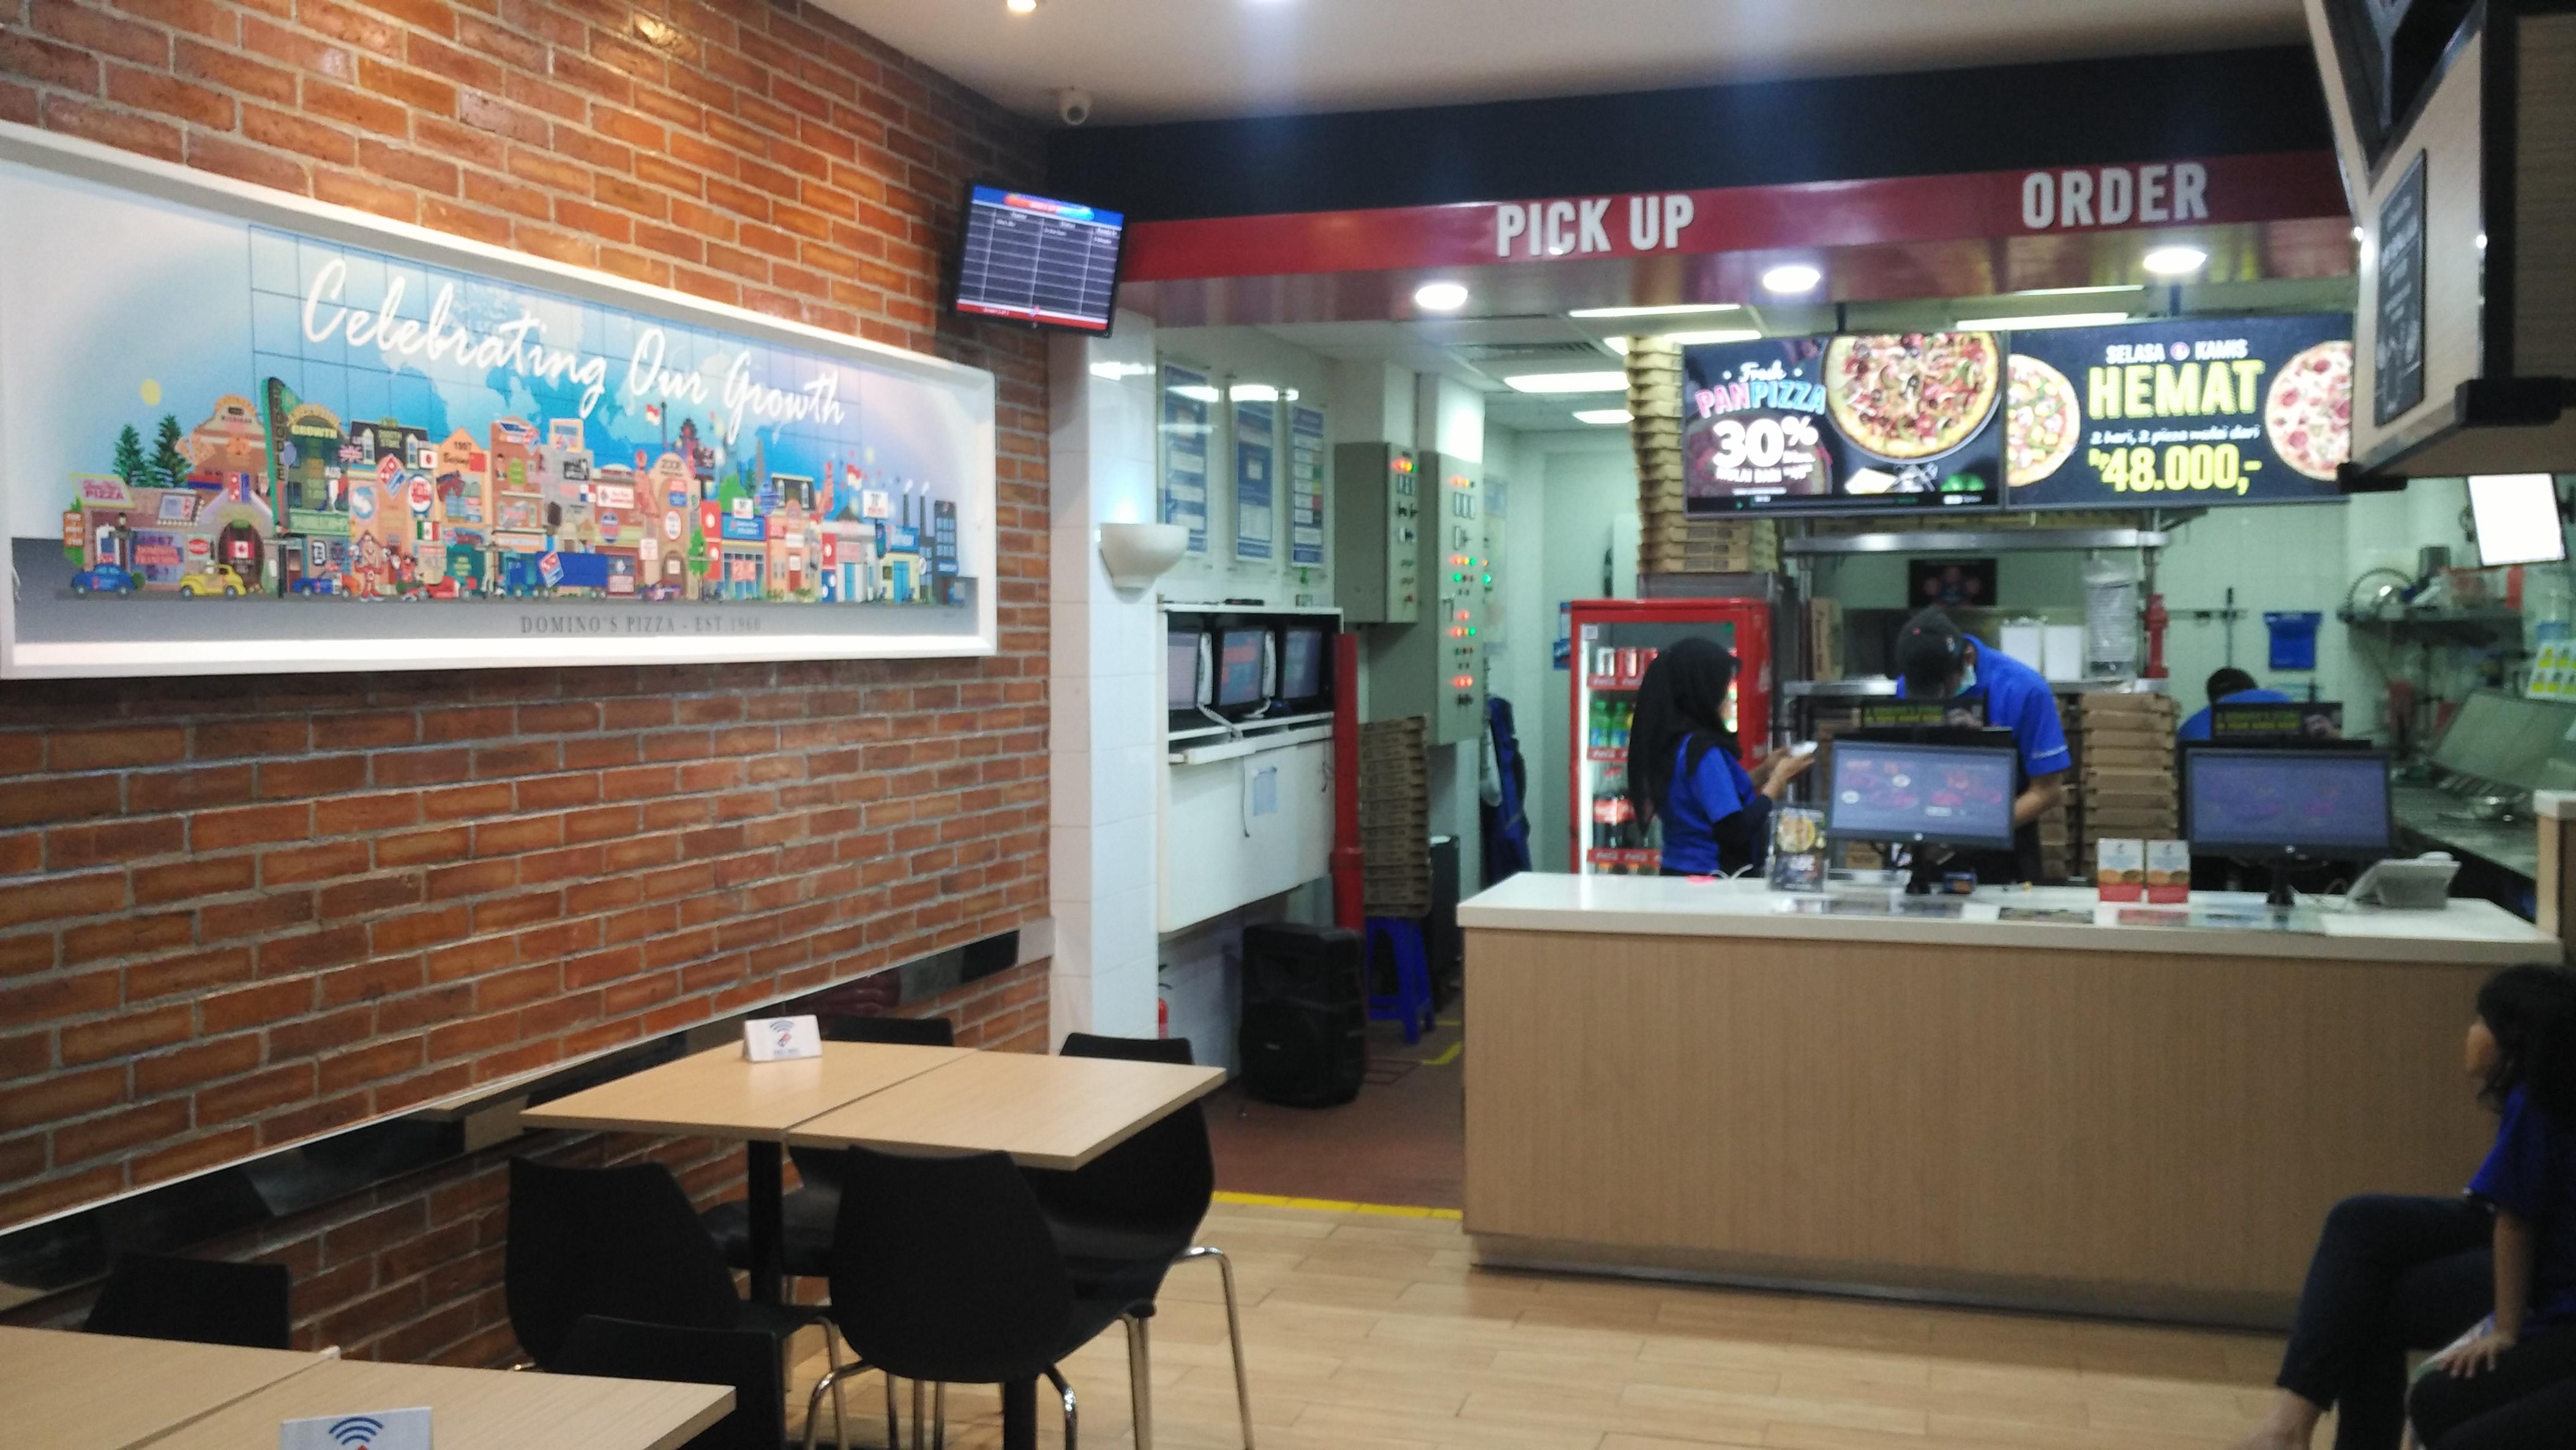 Domino's Pizza - Kec Makasar, Jakarta Timur